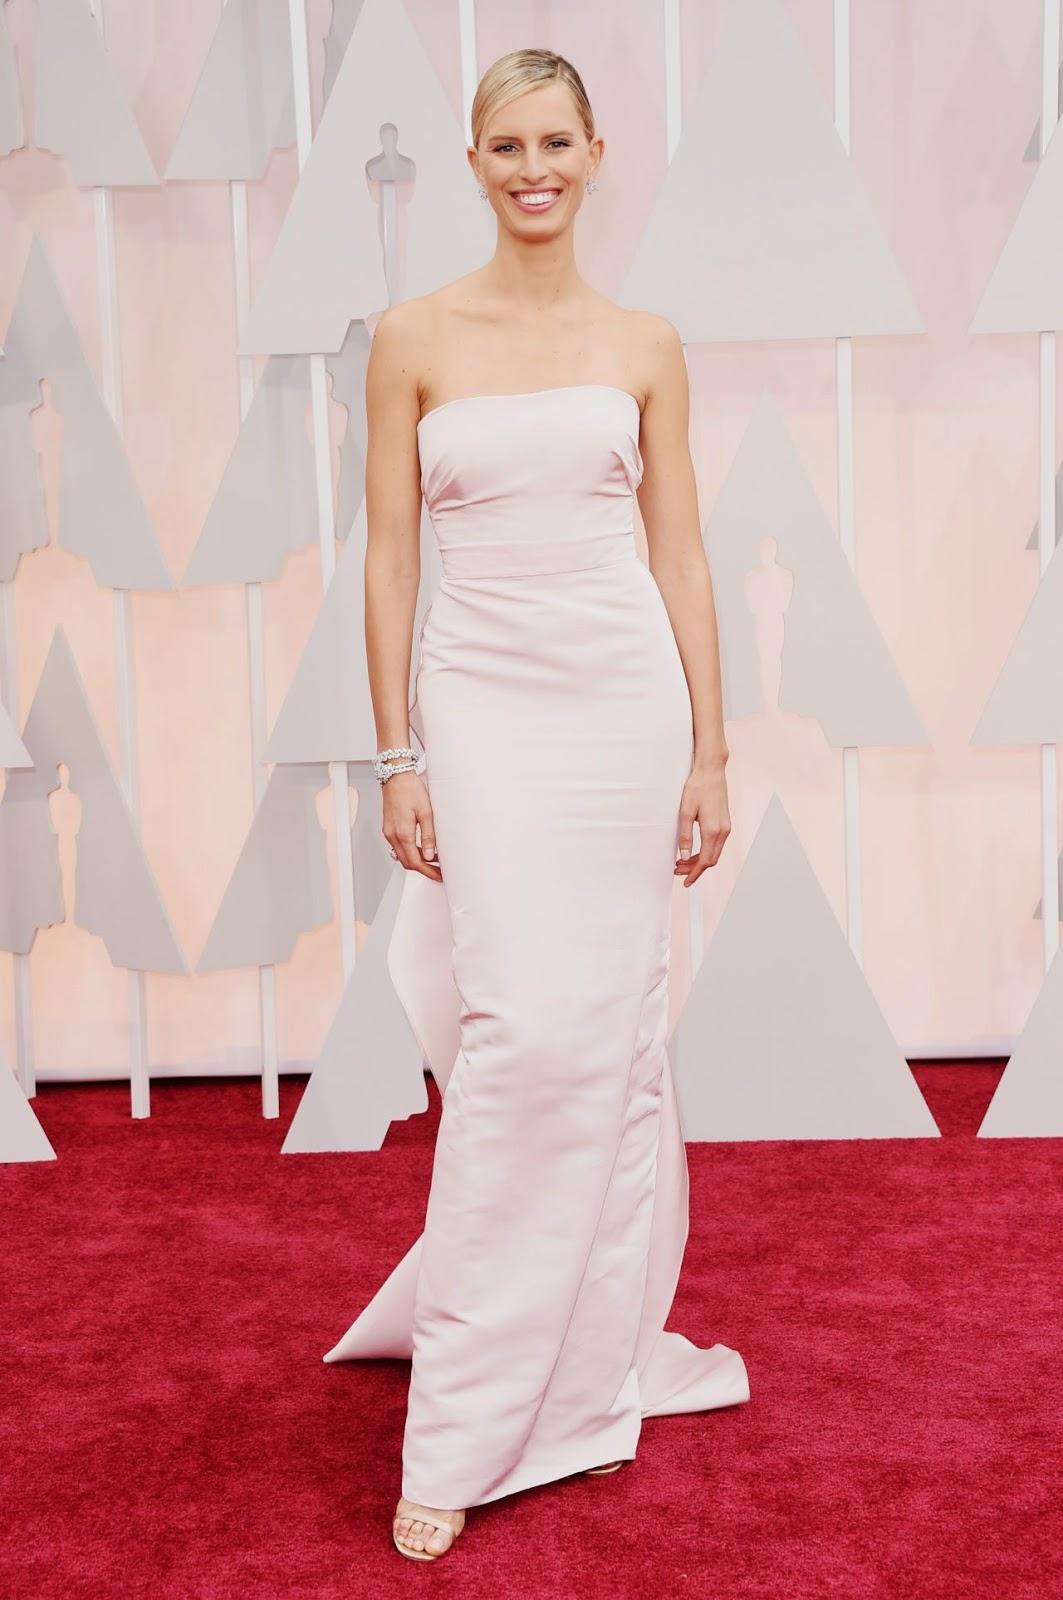 Karolina Kurkova flaunts a Marchesa dress at the 2015 Oscars in Hollywood